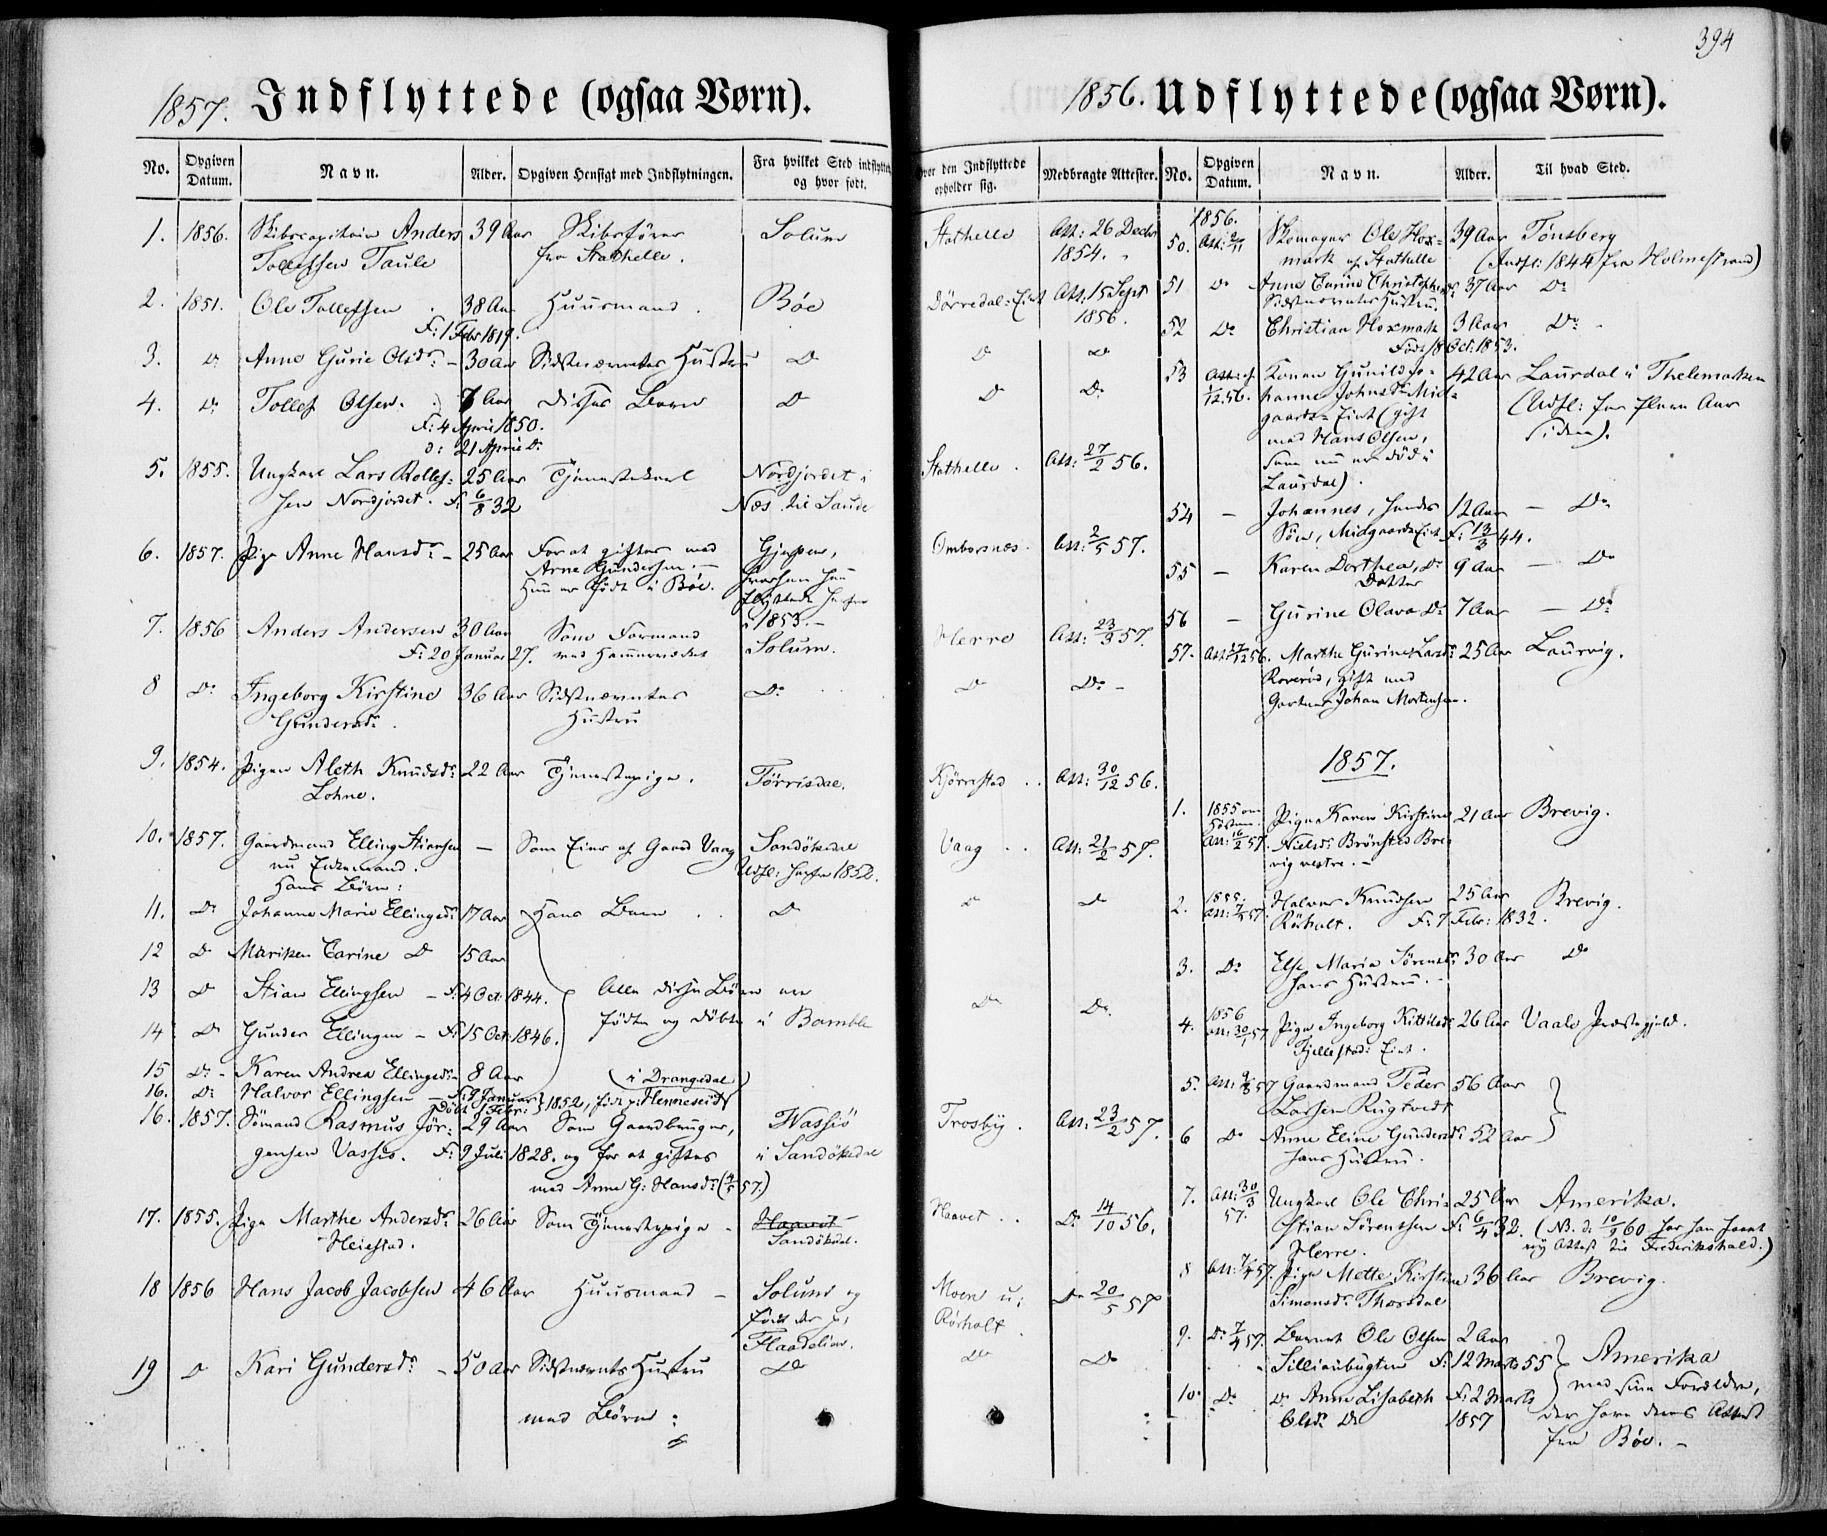 SAKO, Bamble kirkebøker, F/Fa/L0005: Ministerialbok nr. I 5, 1854-1869, s. 394